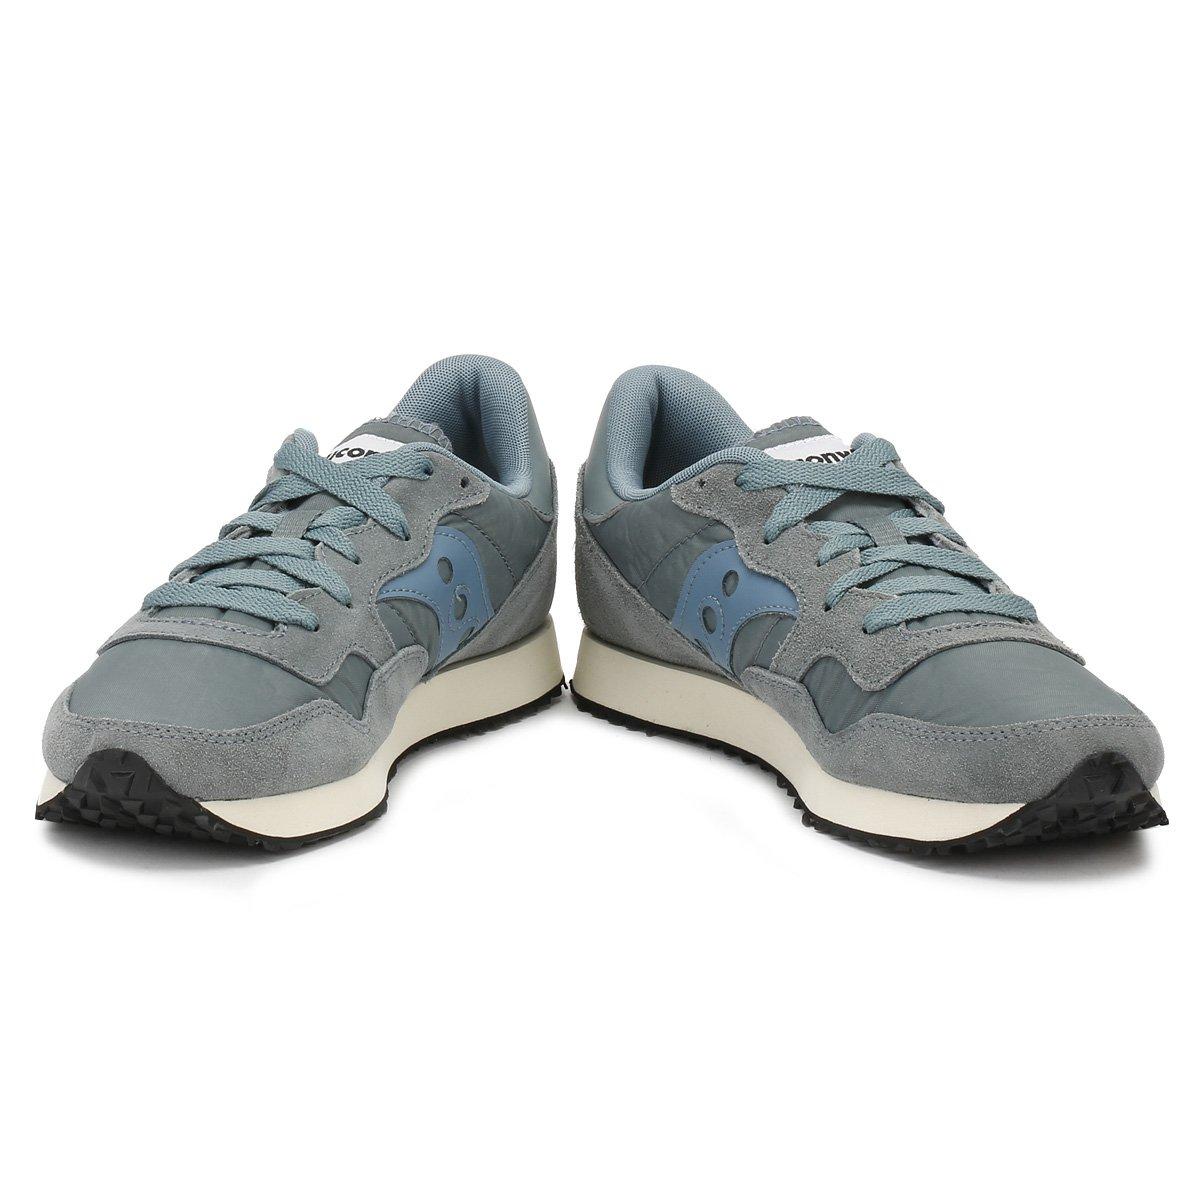 Saucony Dxn Trainer Trainer Trainer Vintage Aqua Grau 692 Damen Sneakers (Aqua/Grau) - b24b78